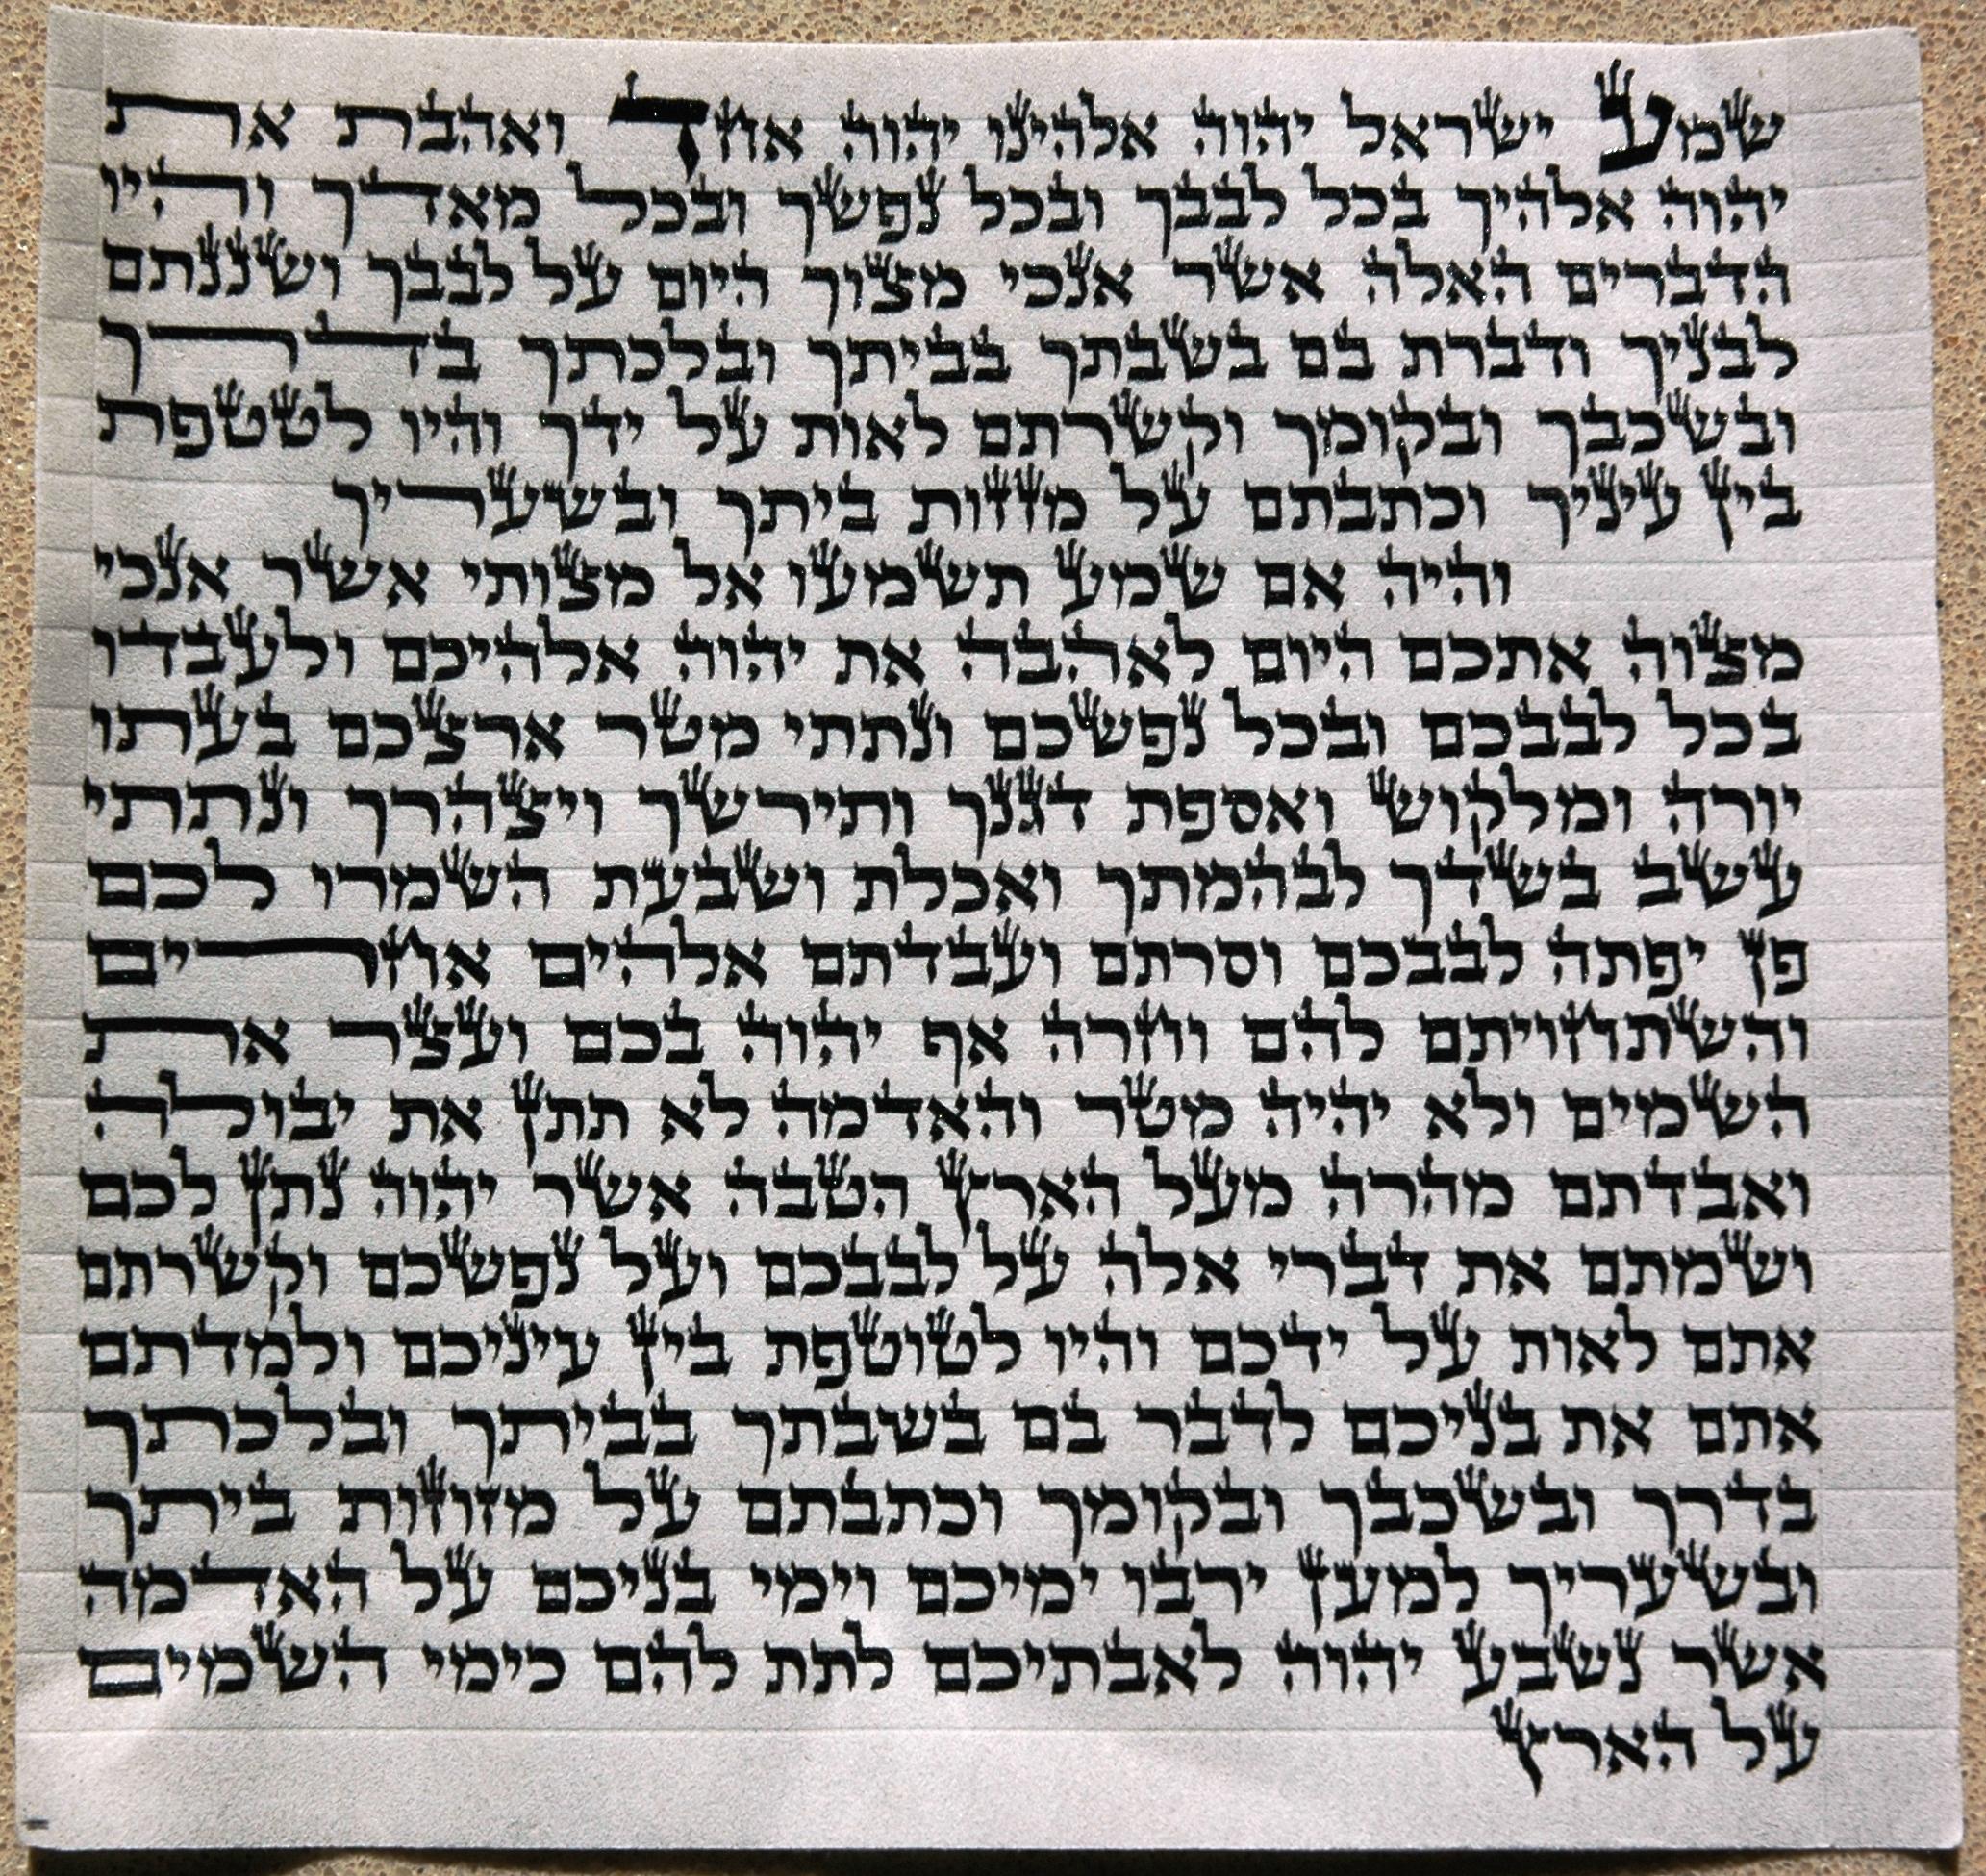 File:Mezuzah scroll sepharad real front.JPG - Wikimedia Commons